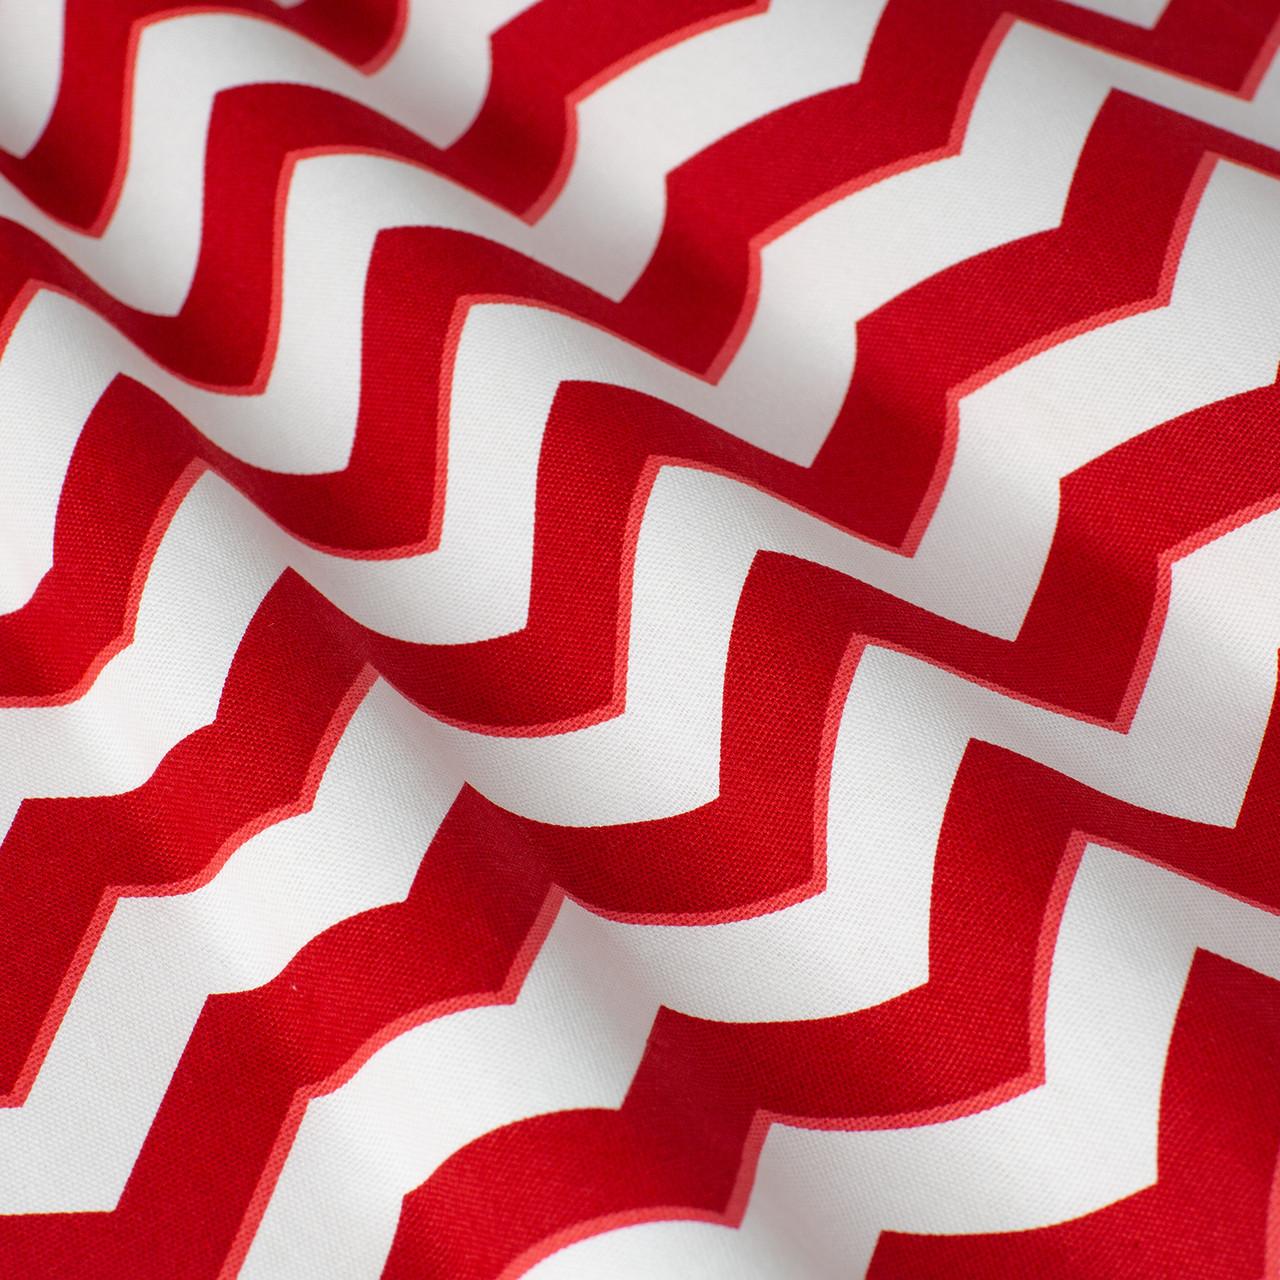 Ткань декоративная для штор, подушек с красно-белым зигзагом и тефлоном